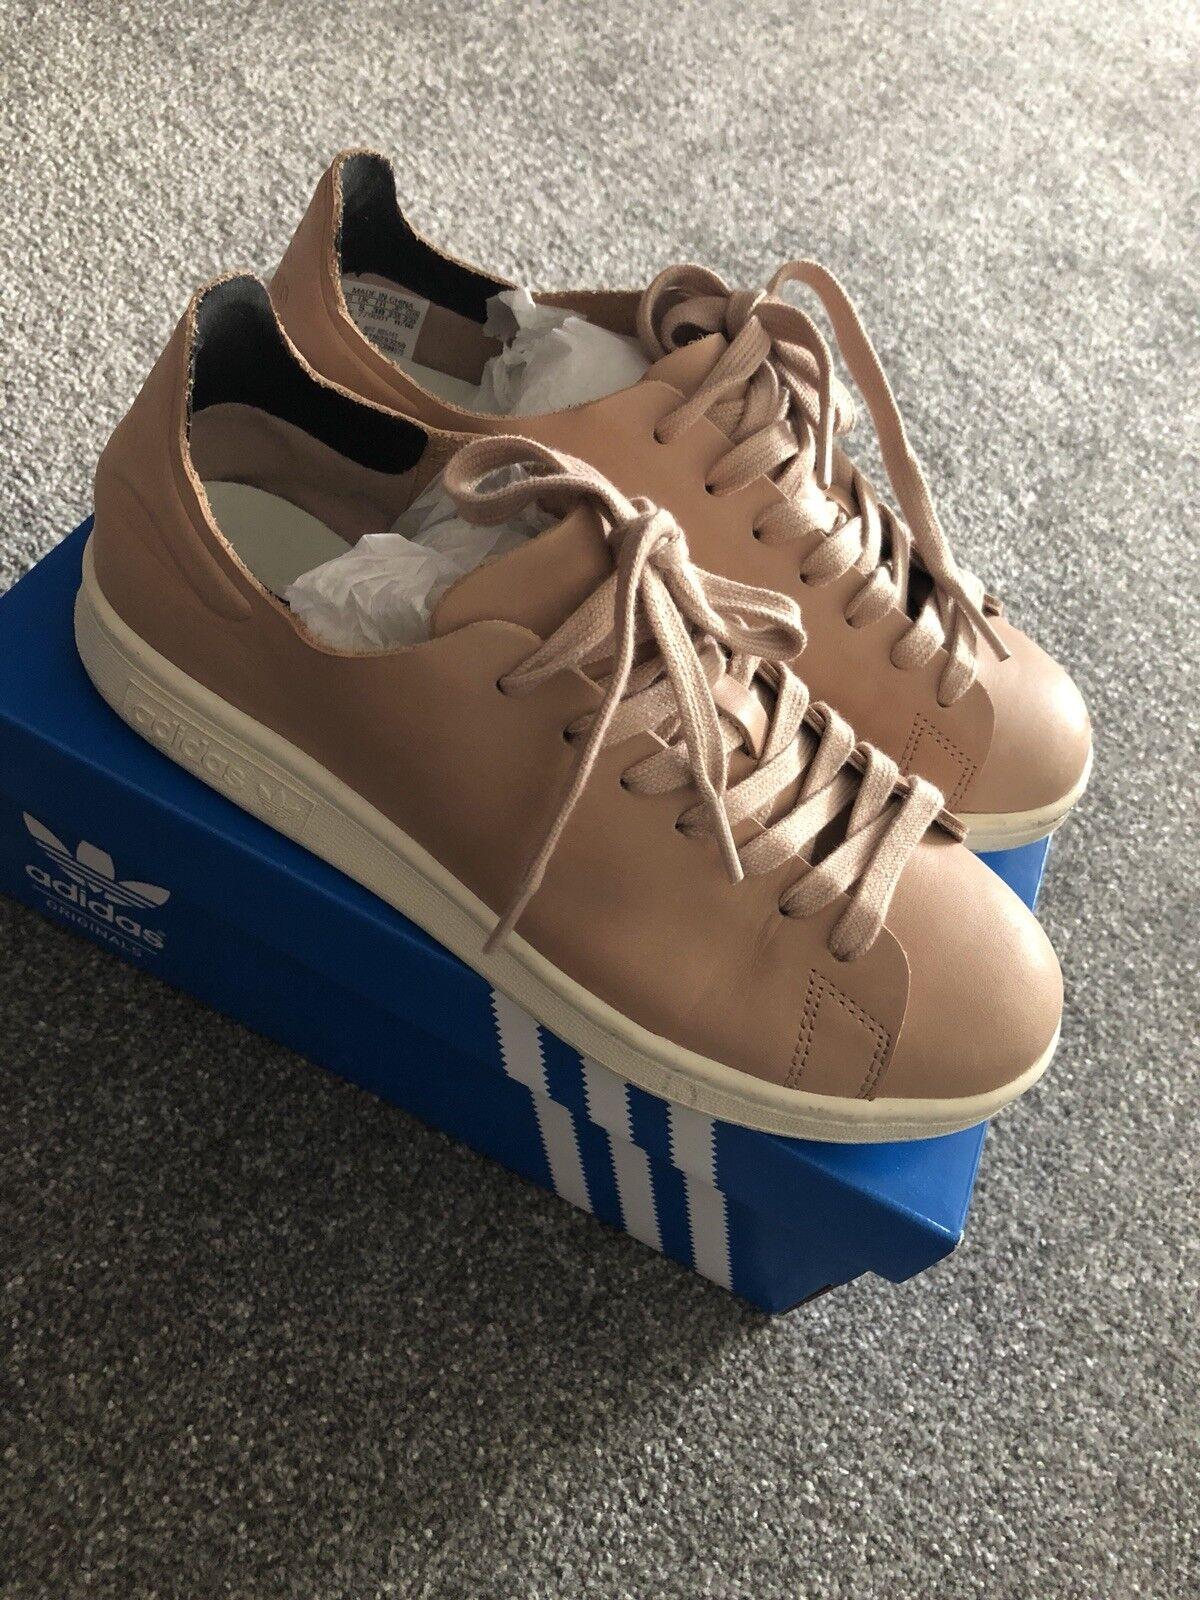 Adidas Stan Smith. UK Comfortable Casual wild